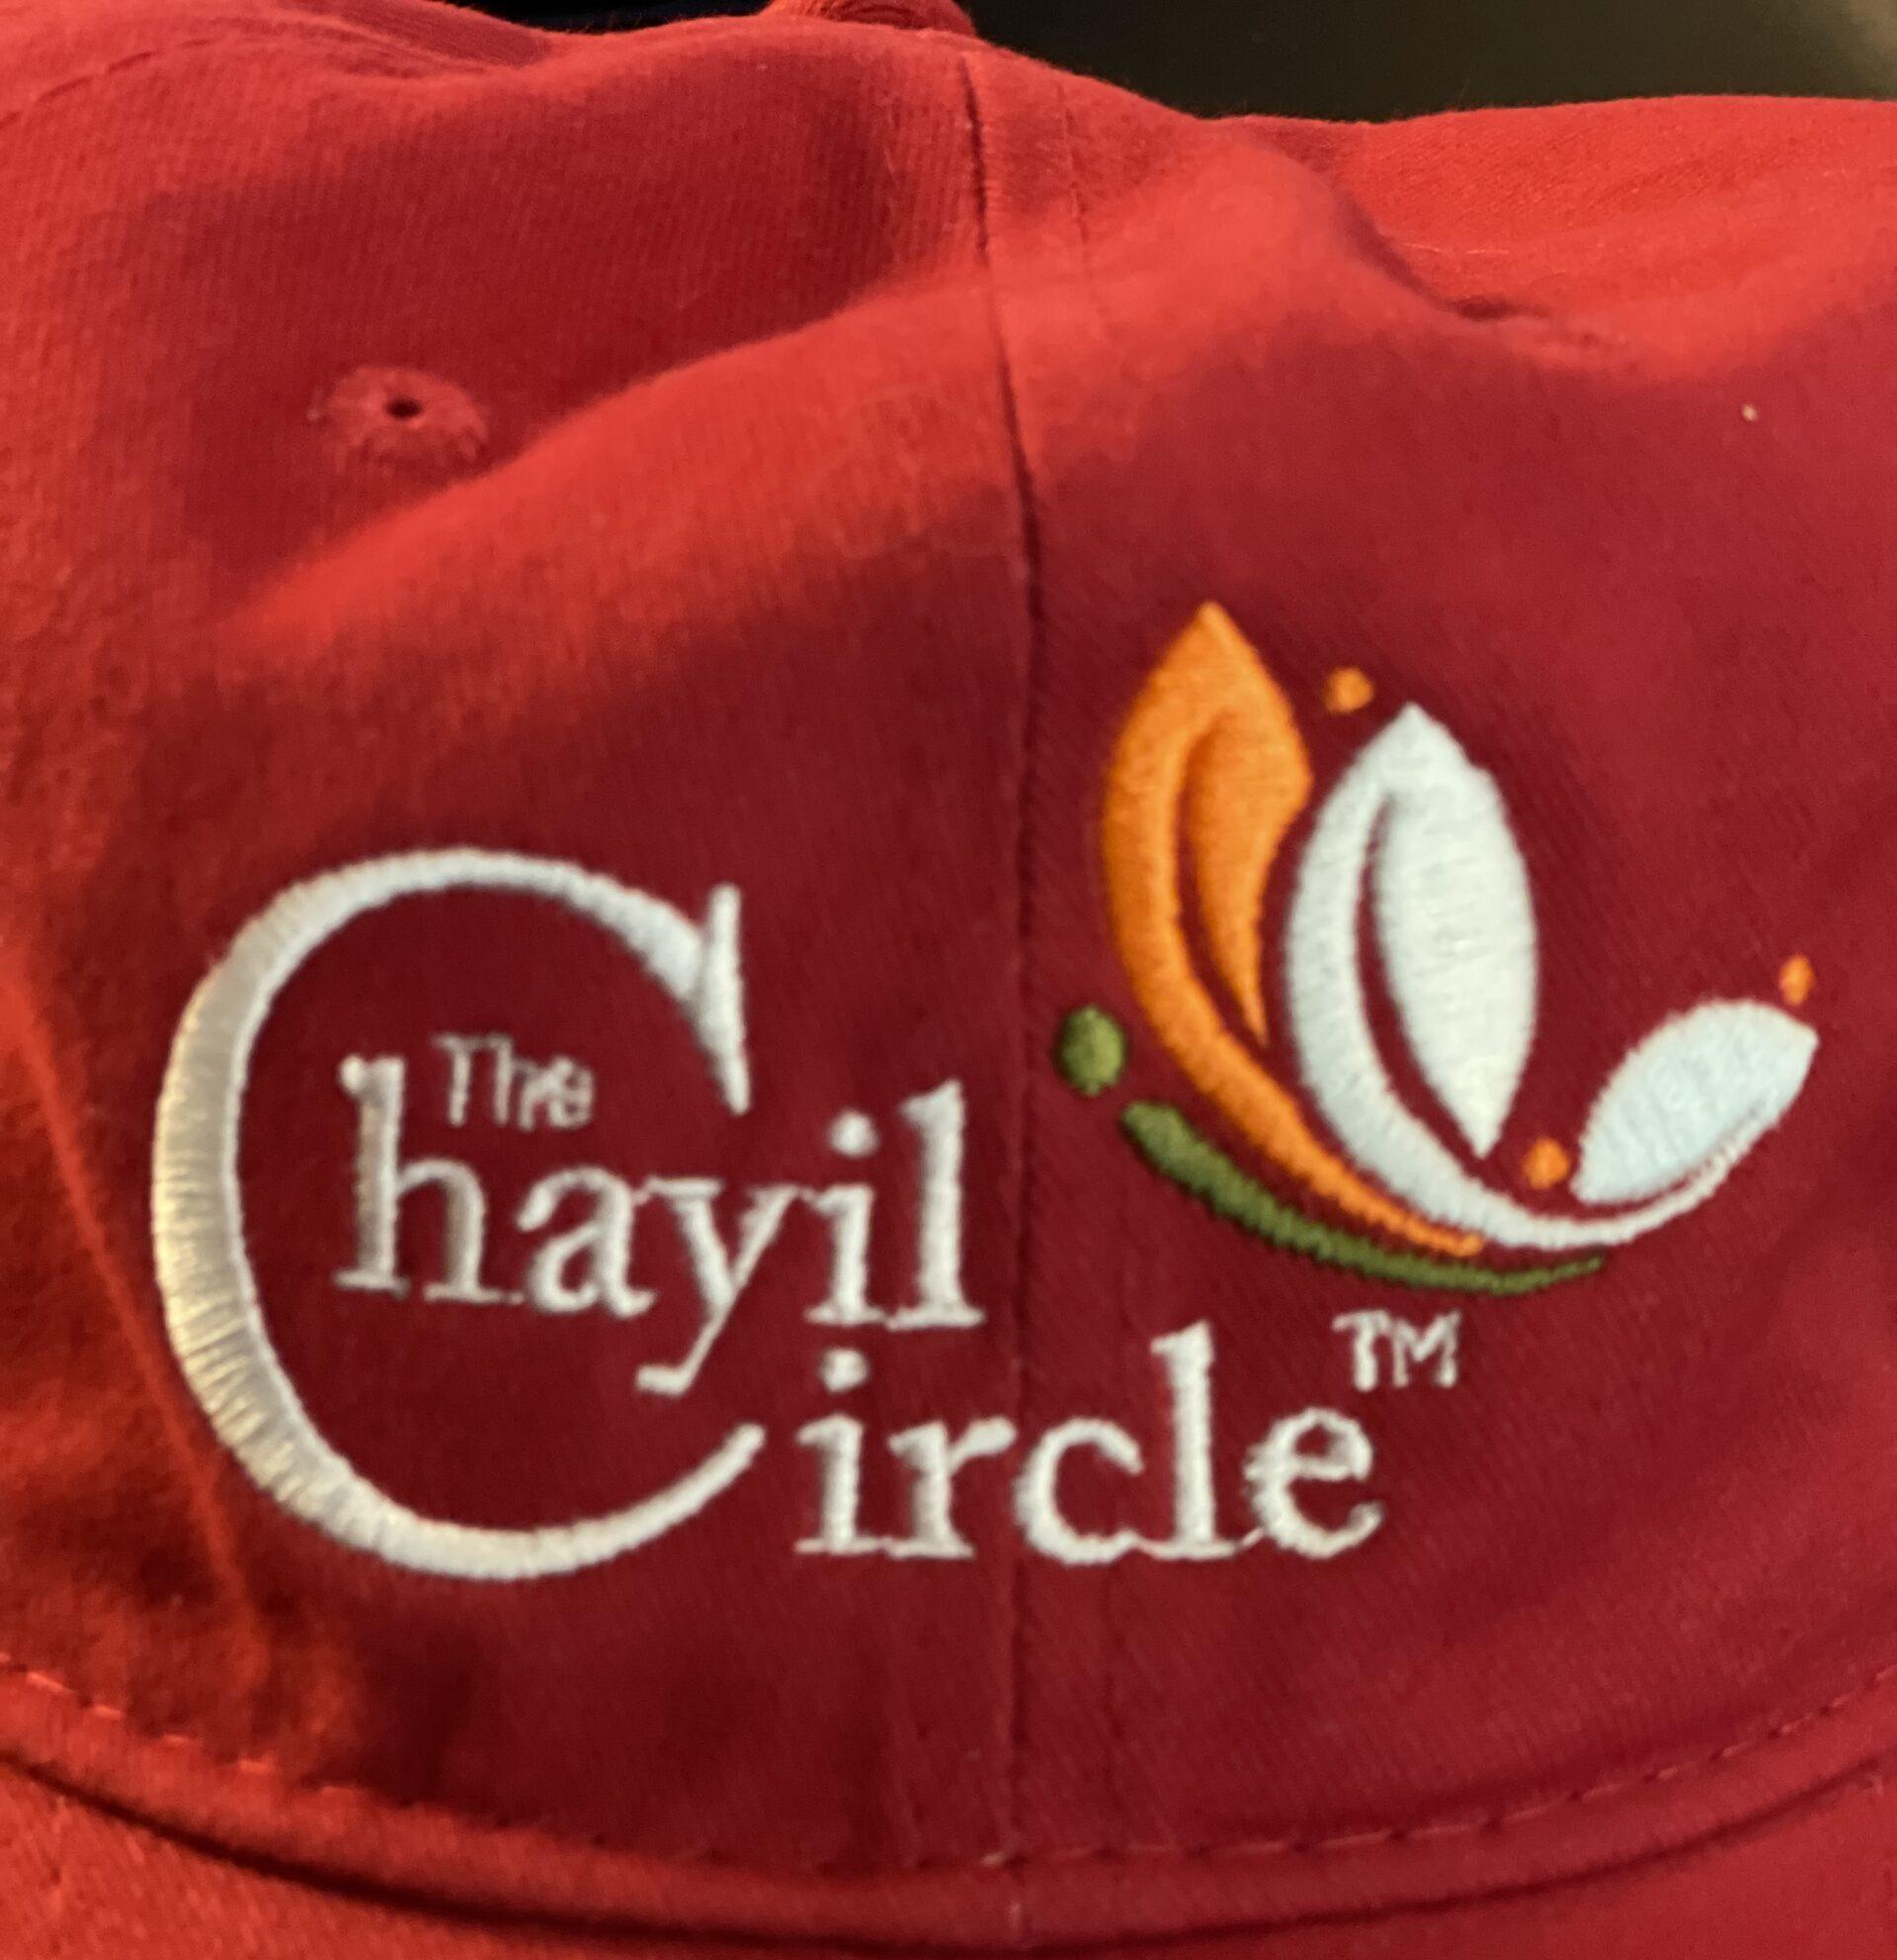 The Chayil Circle Cap